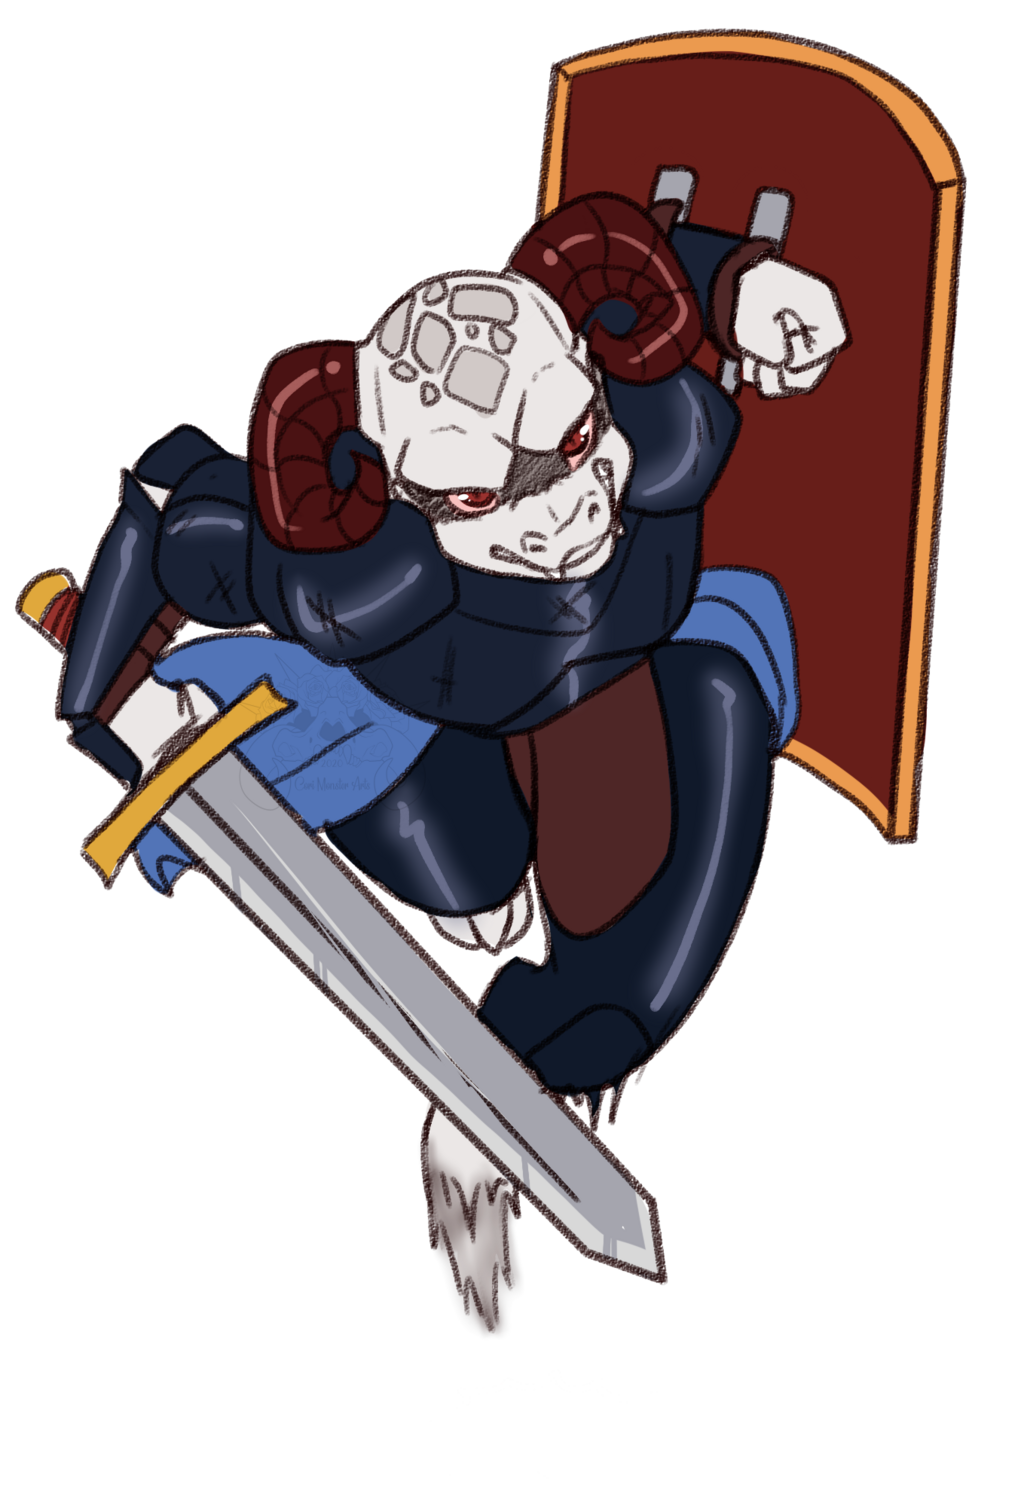 Commission - Gigawolf102